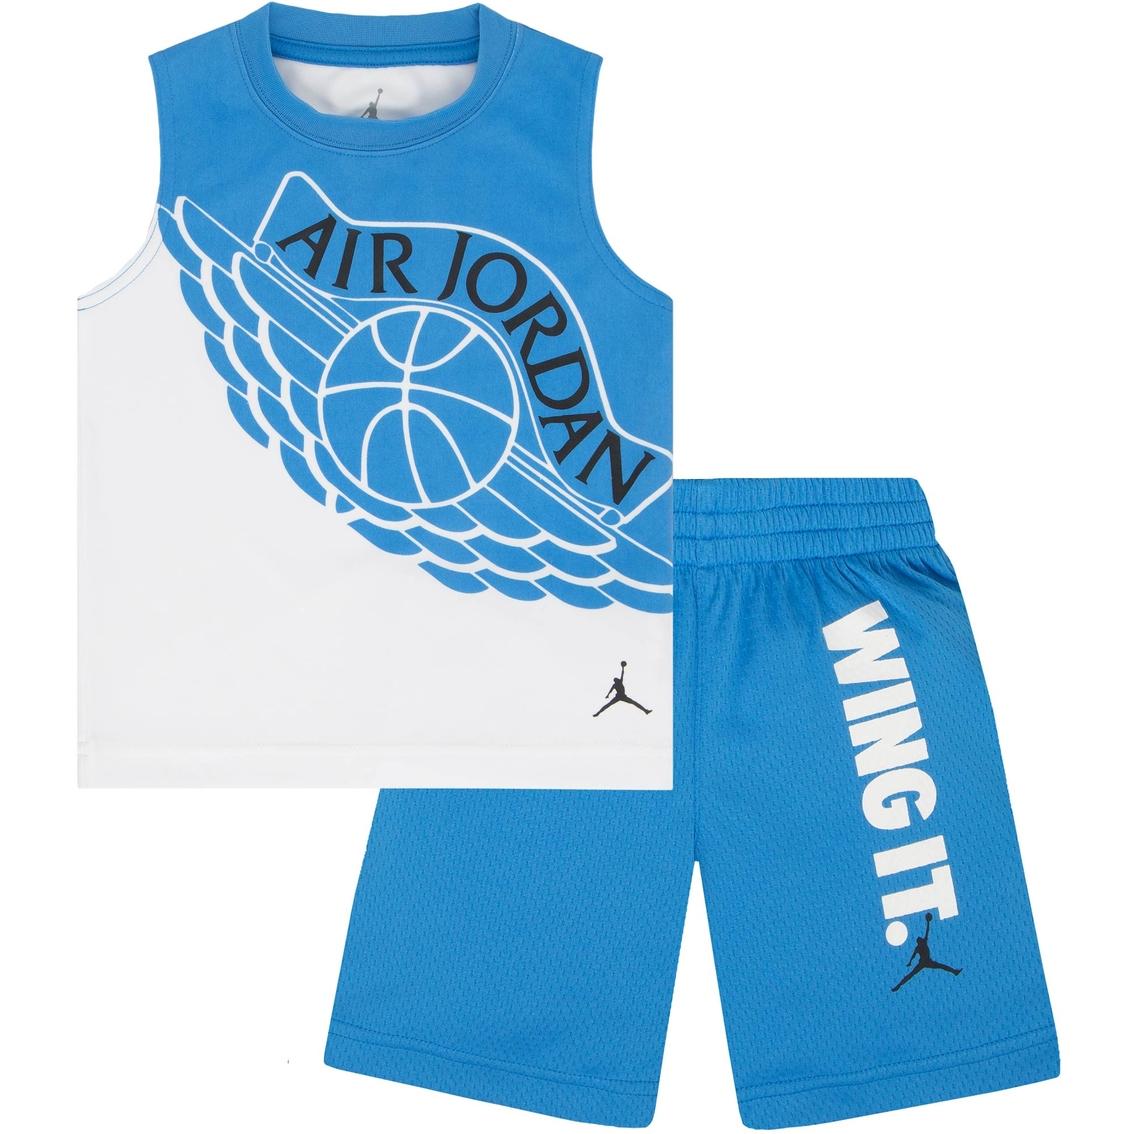 c52c2703edc Jordan Toddler Boys 2 Pc. Tricot Tank And Shorts Set | Toddler Boys ...